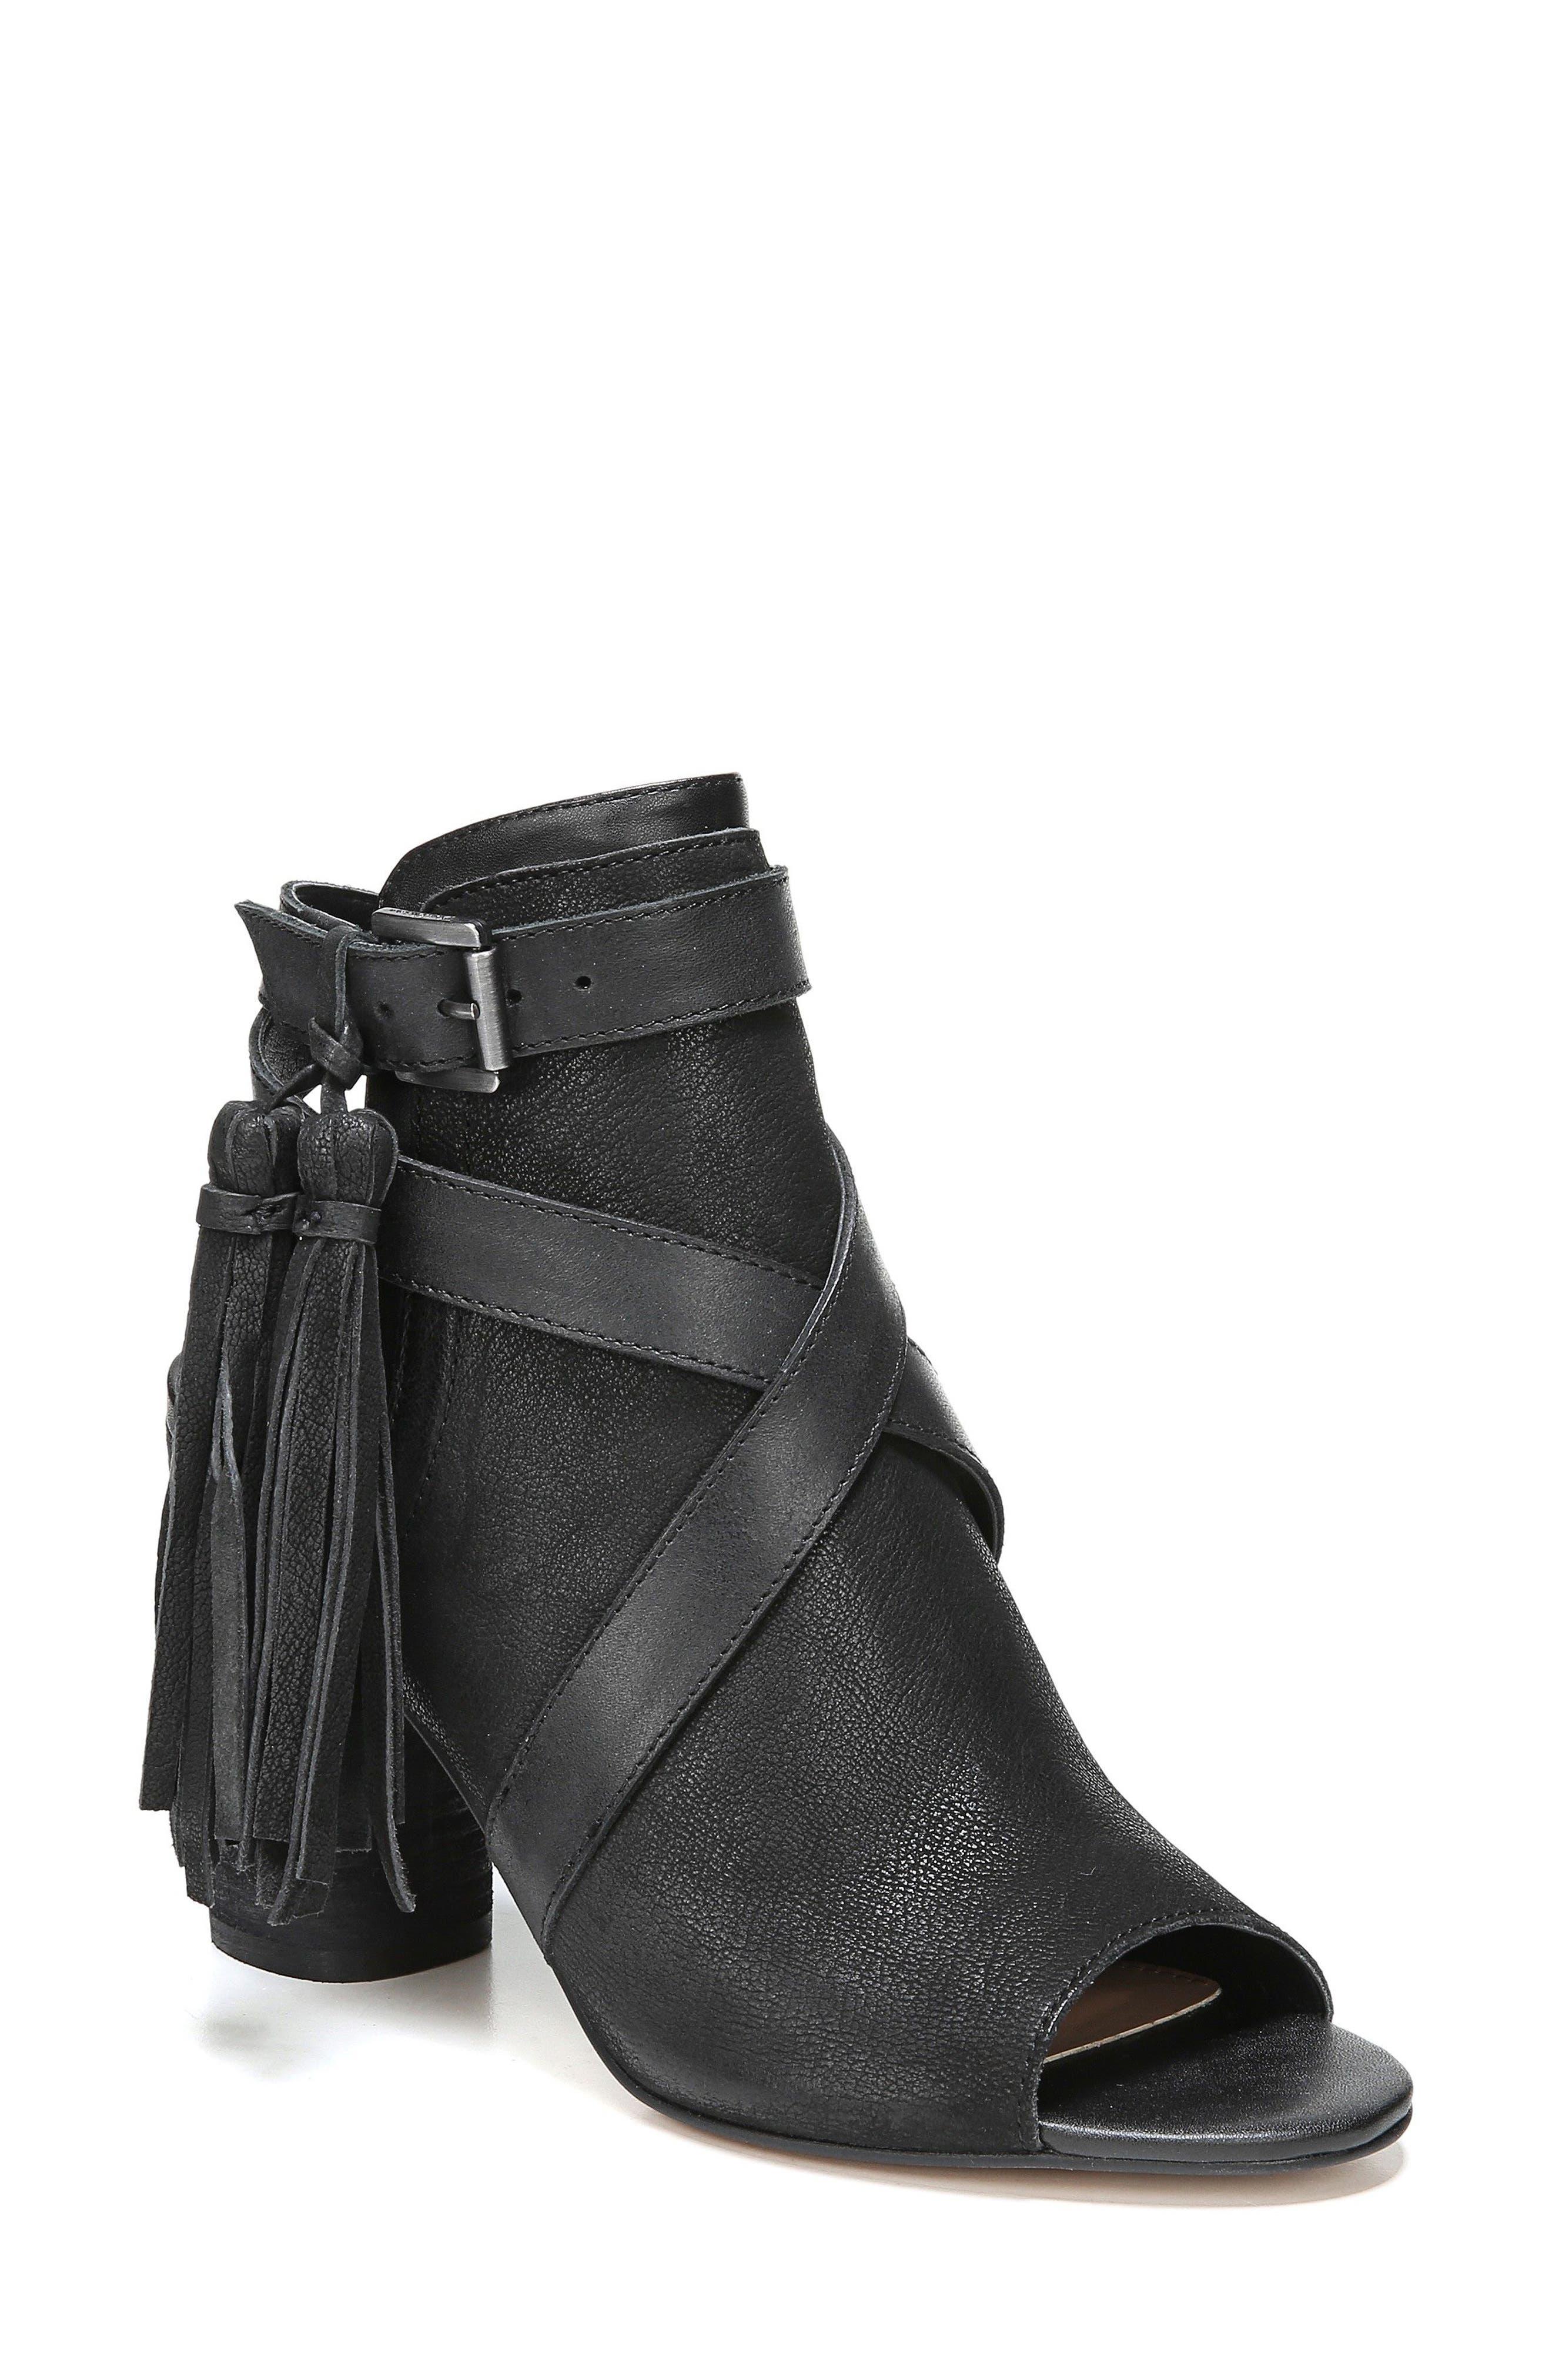 Vermont Block Heel Sandal,                             Main thumbnail 1, color,                             001